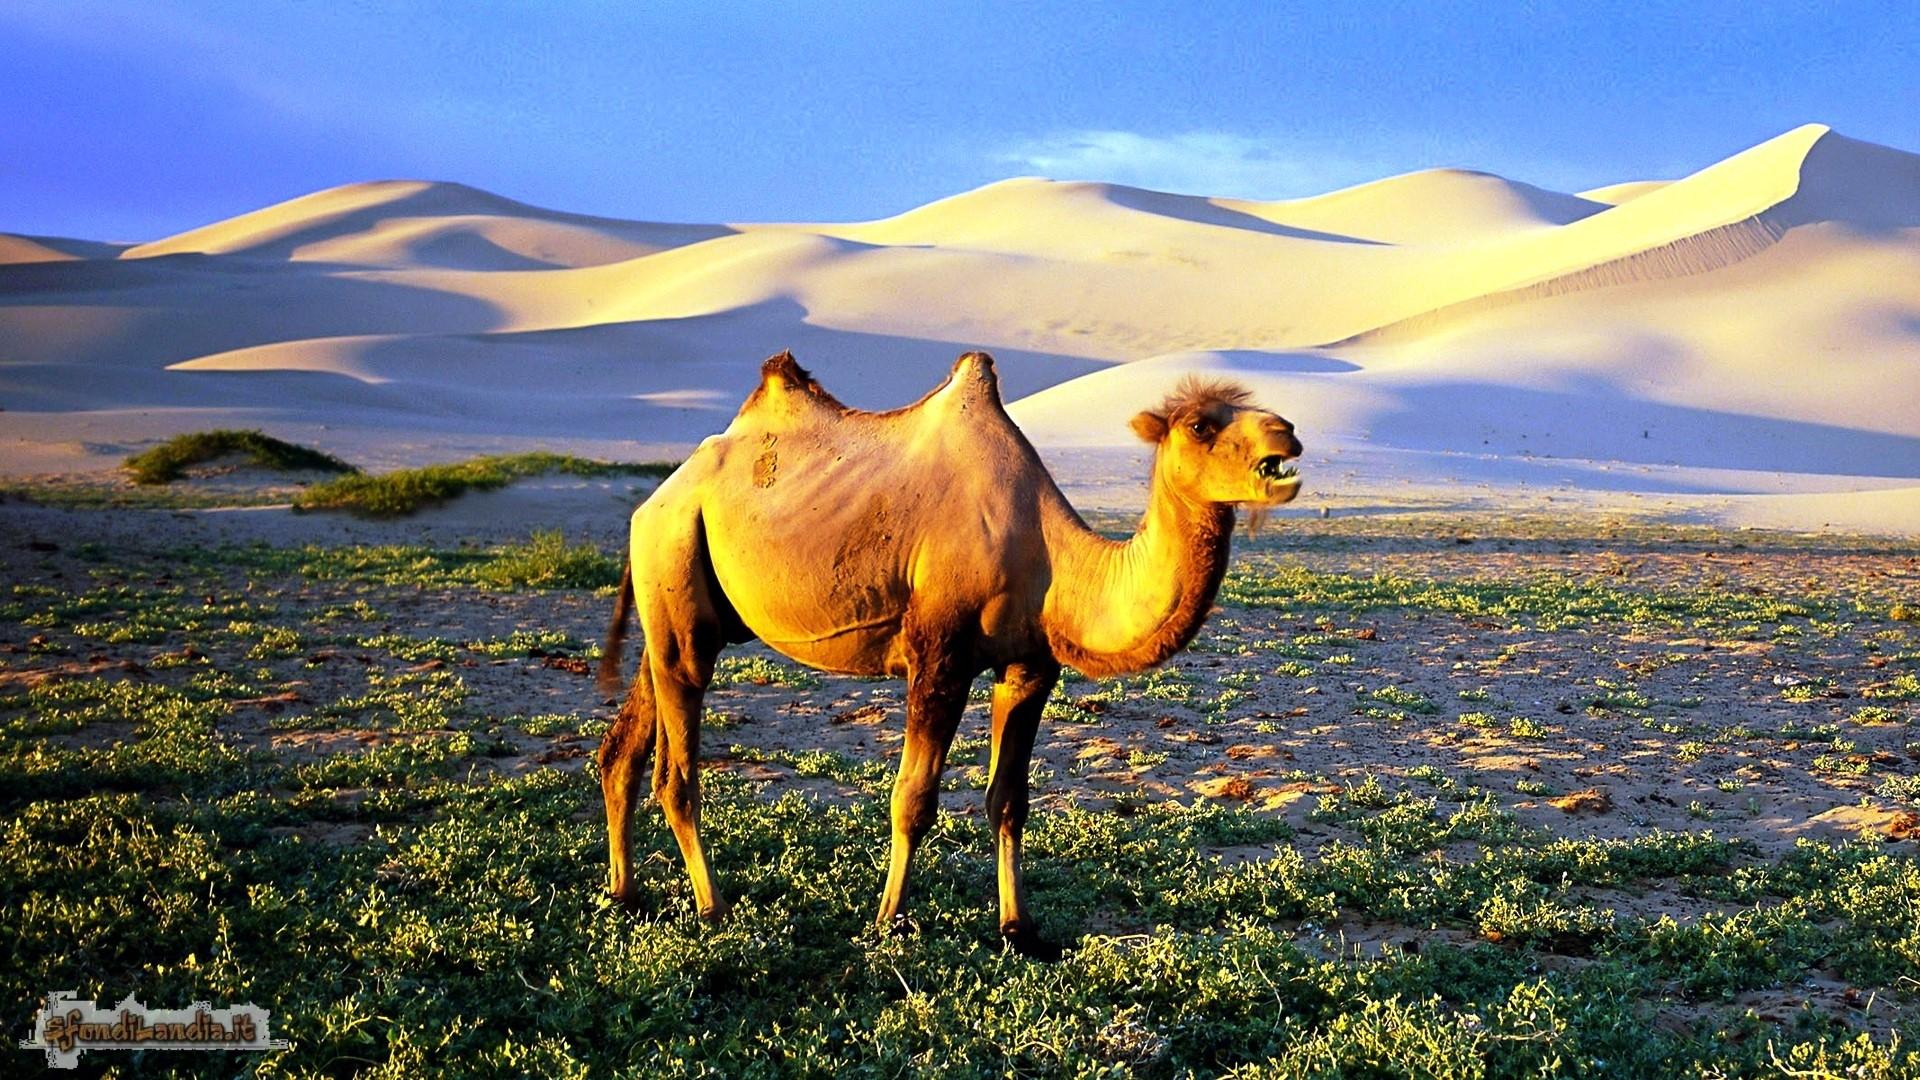 Cammello nelle dune